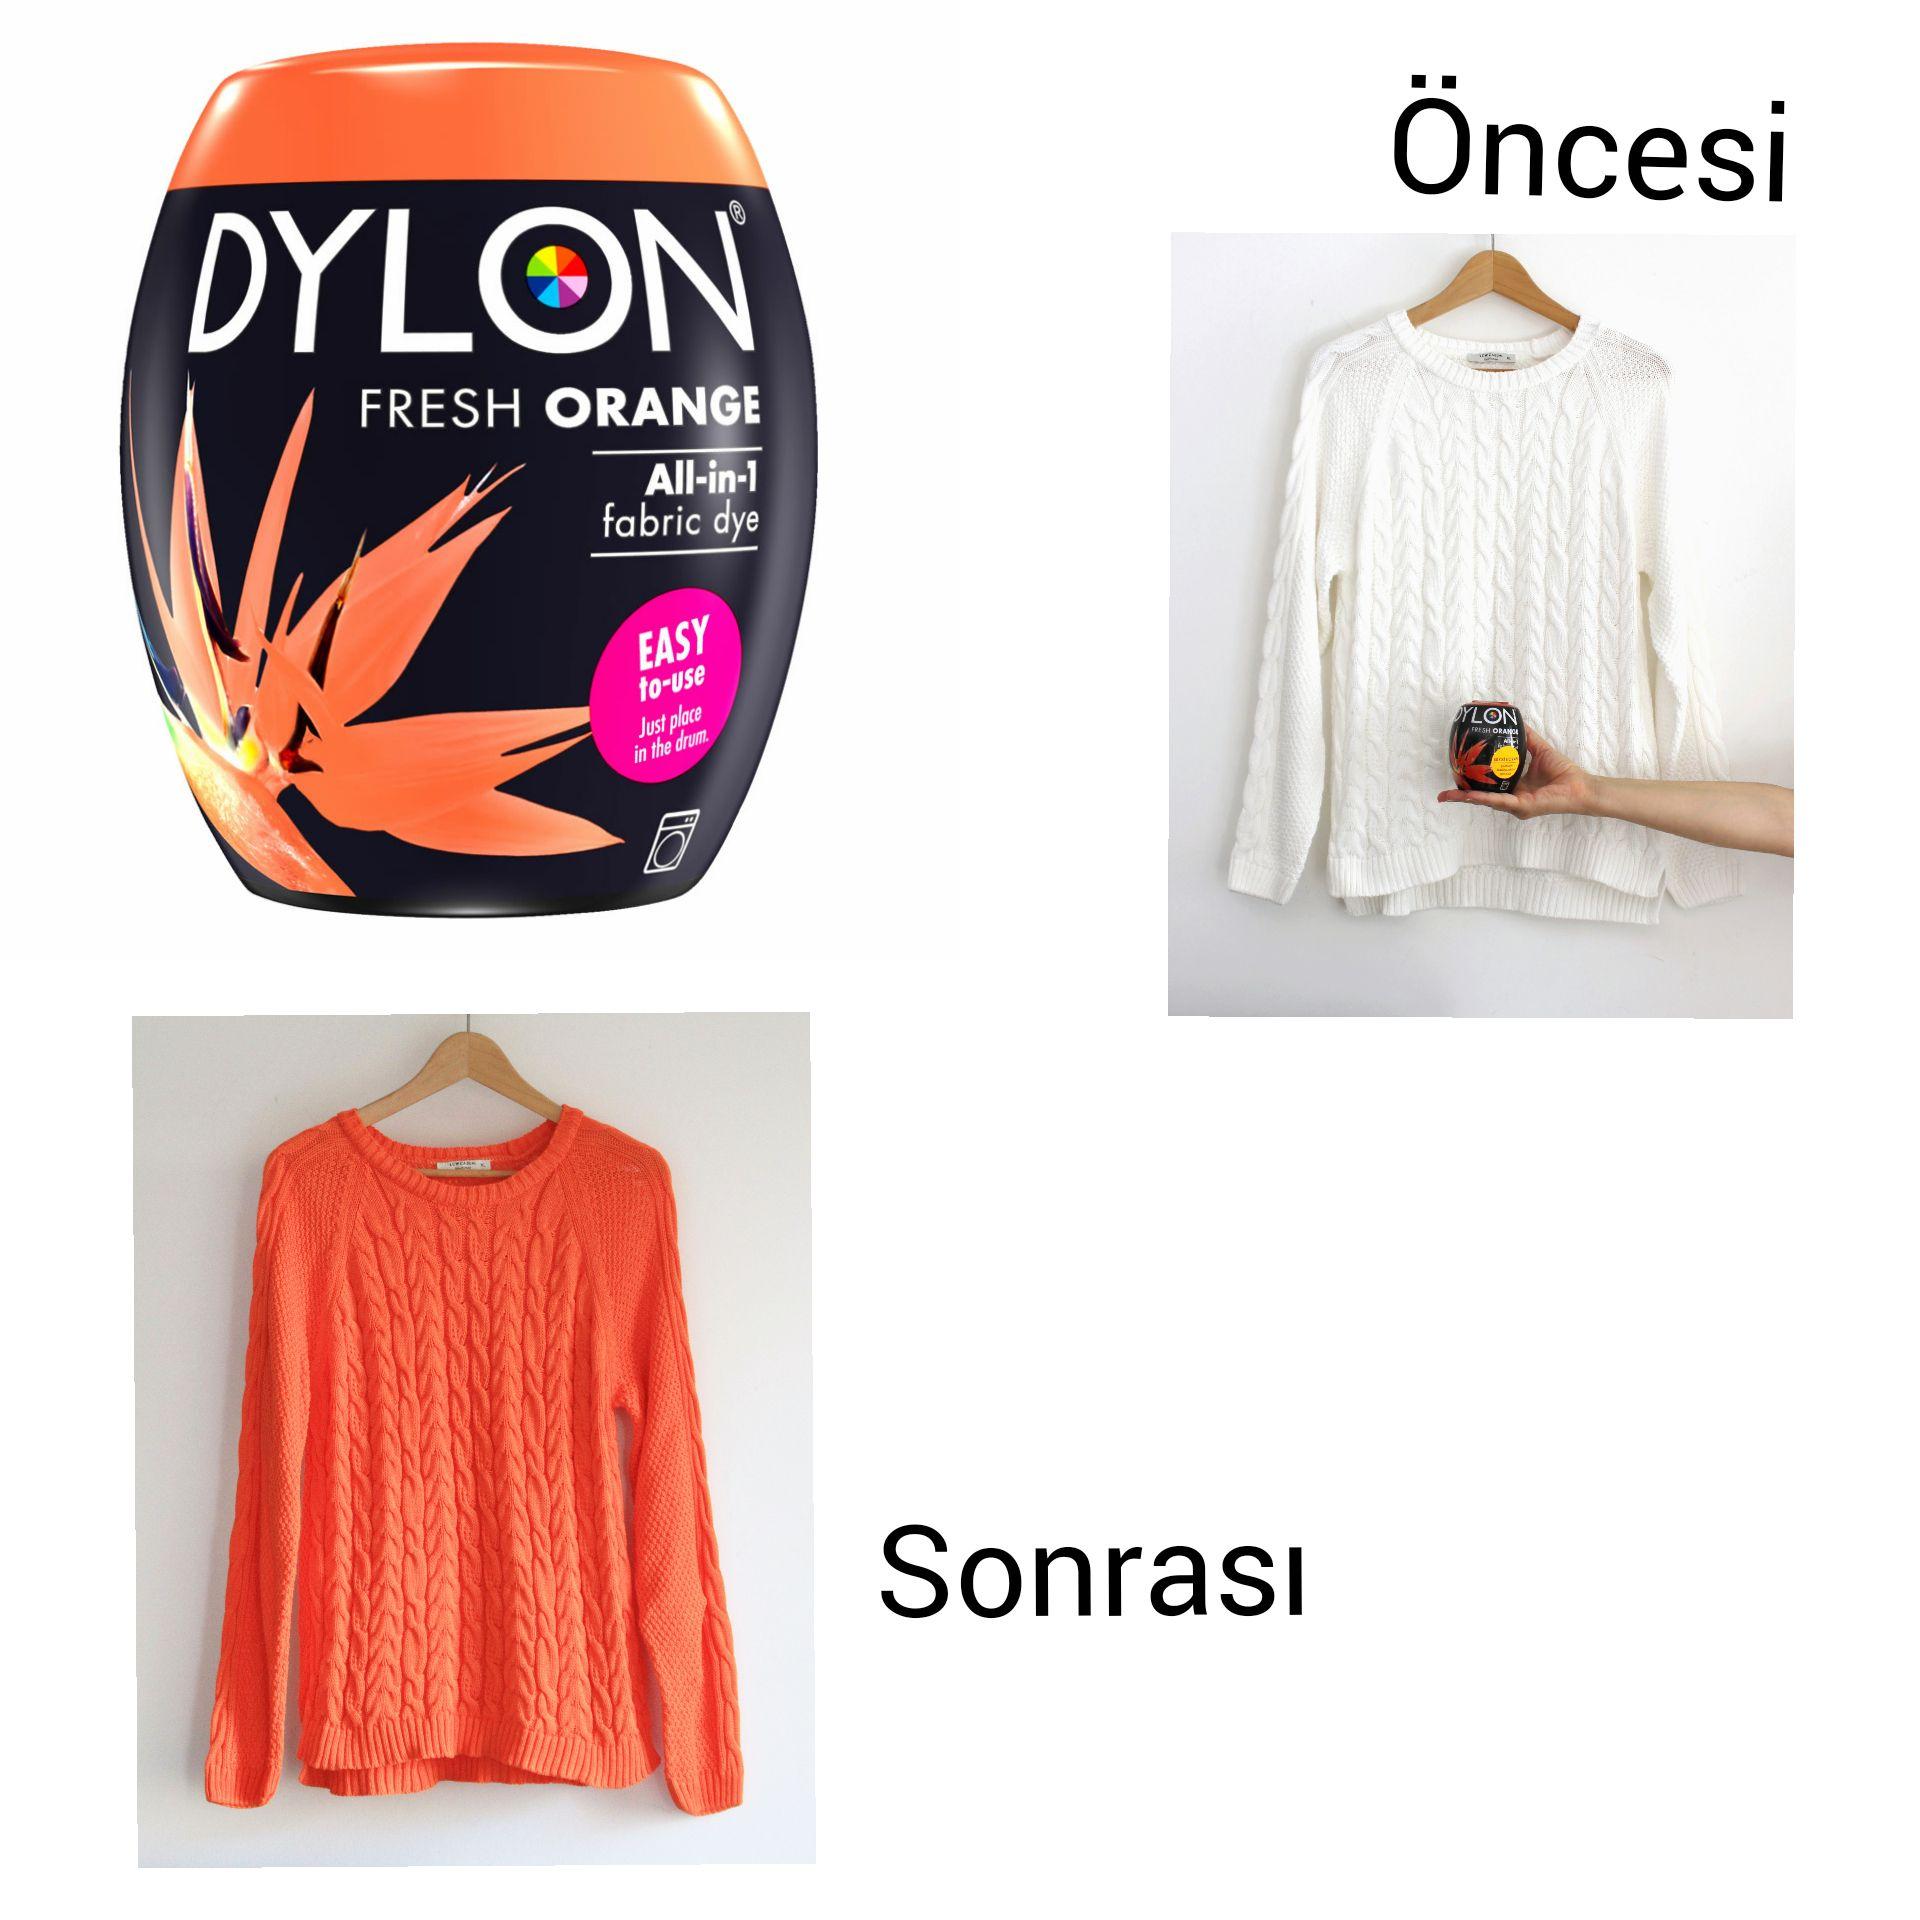 Dylon Pod Turuncu Rengi Fresh Orange Fabric Dye Rengimiz Ile Pamuk Icerikli Bir Kazak Boyadik Turuncu Kumas Renkler